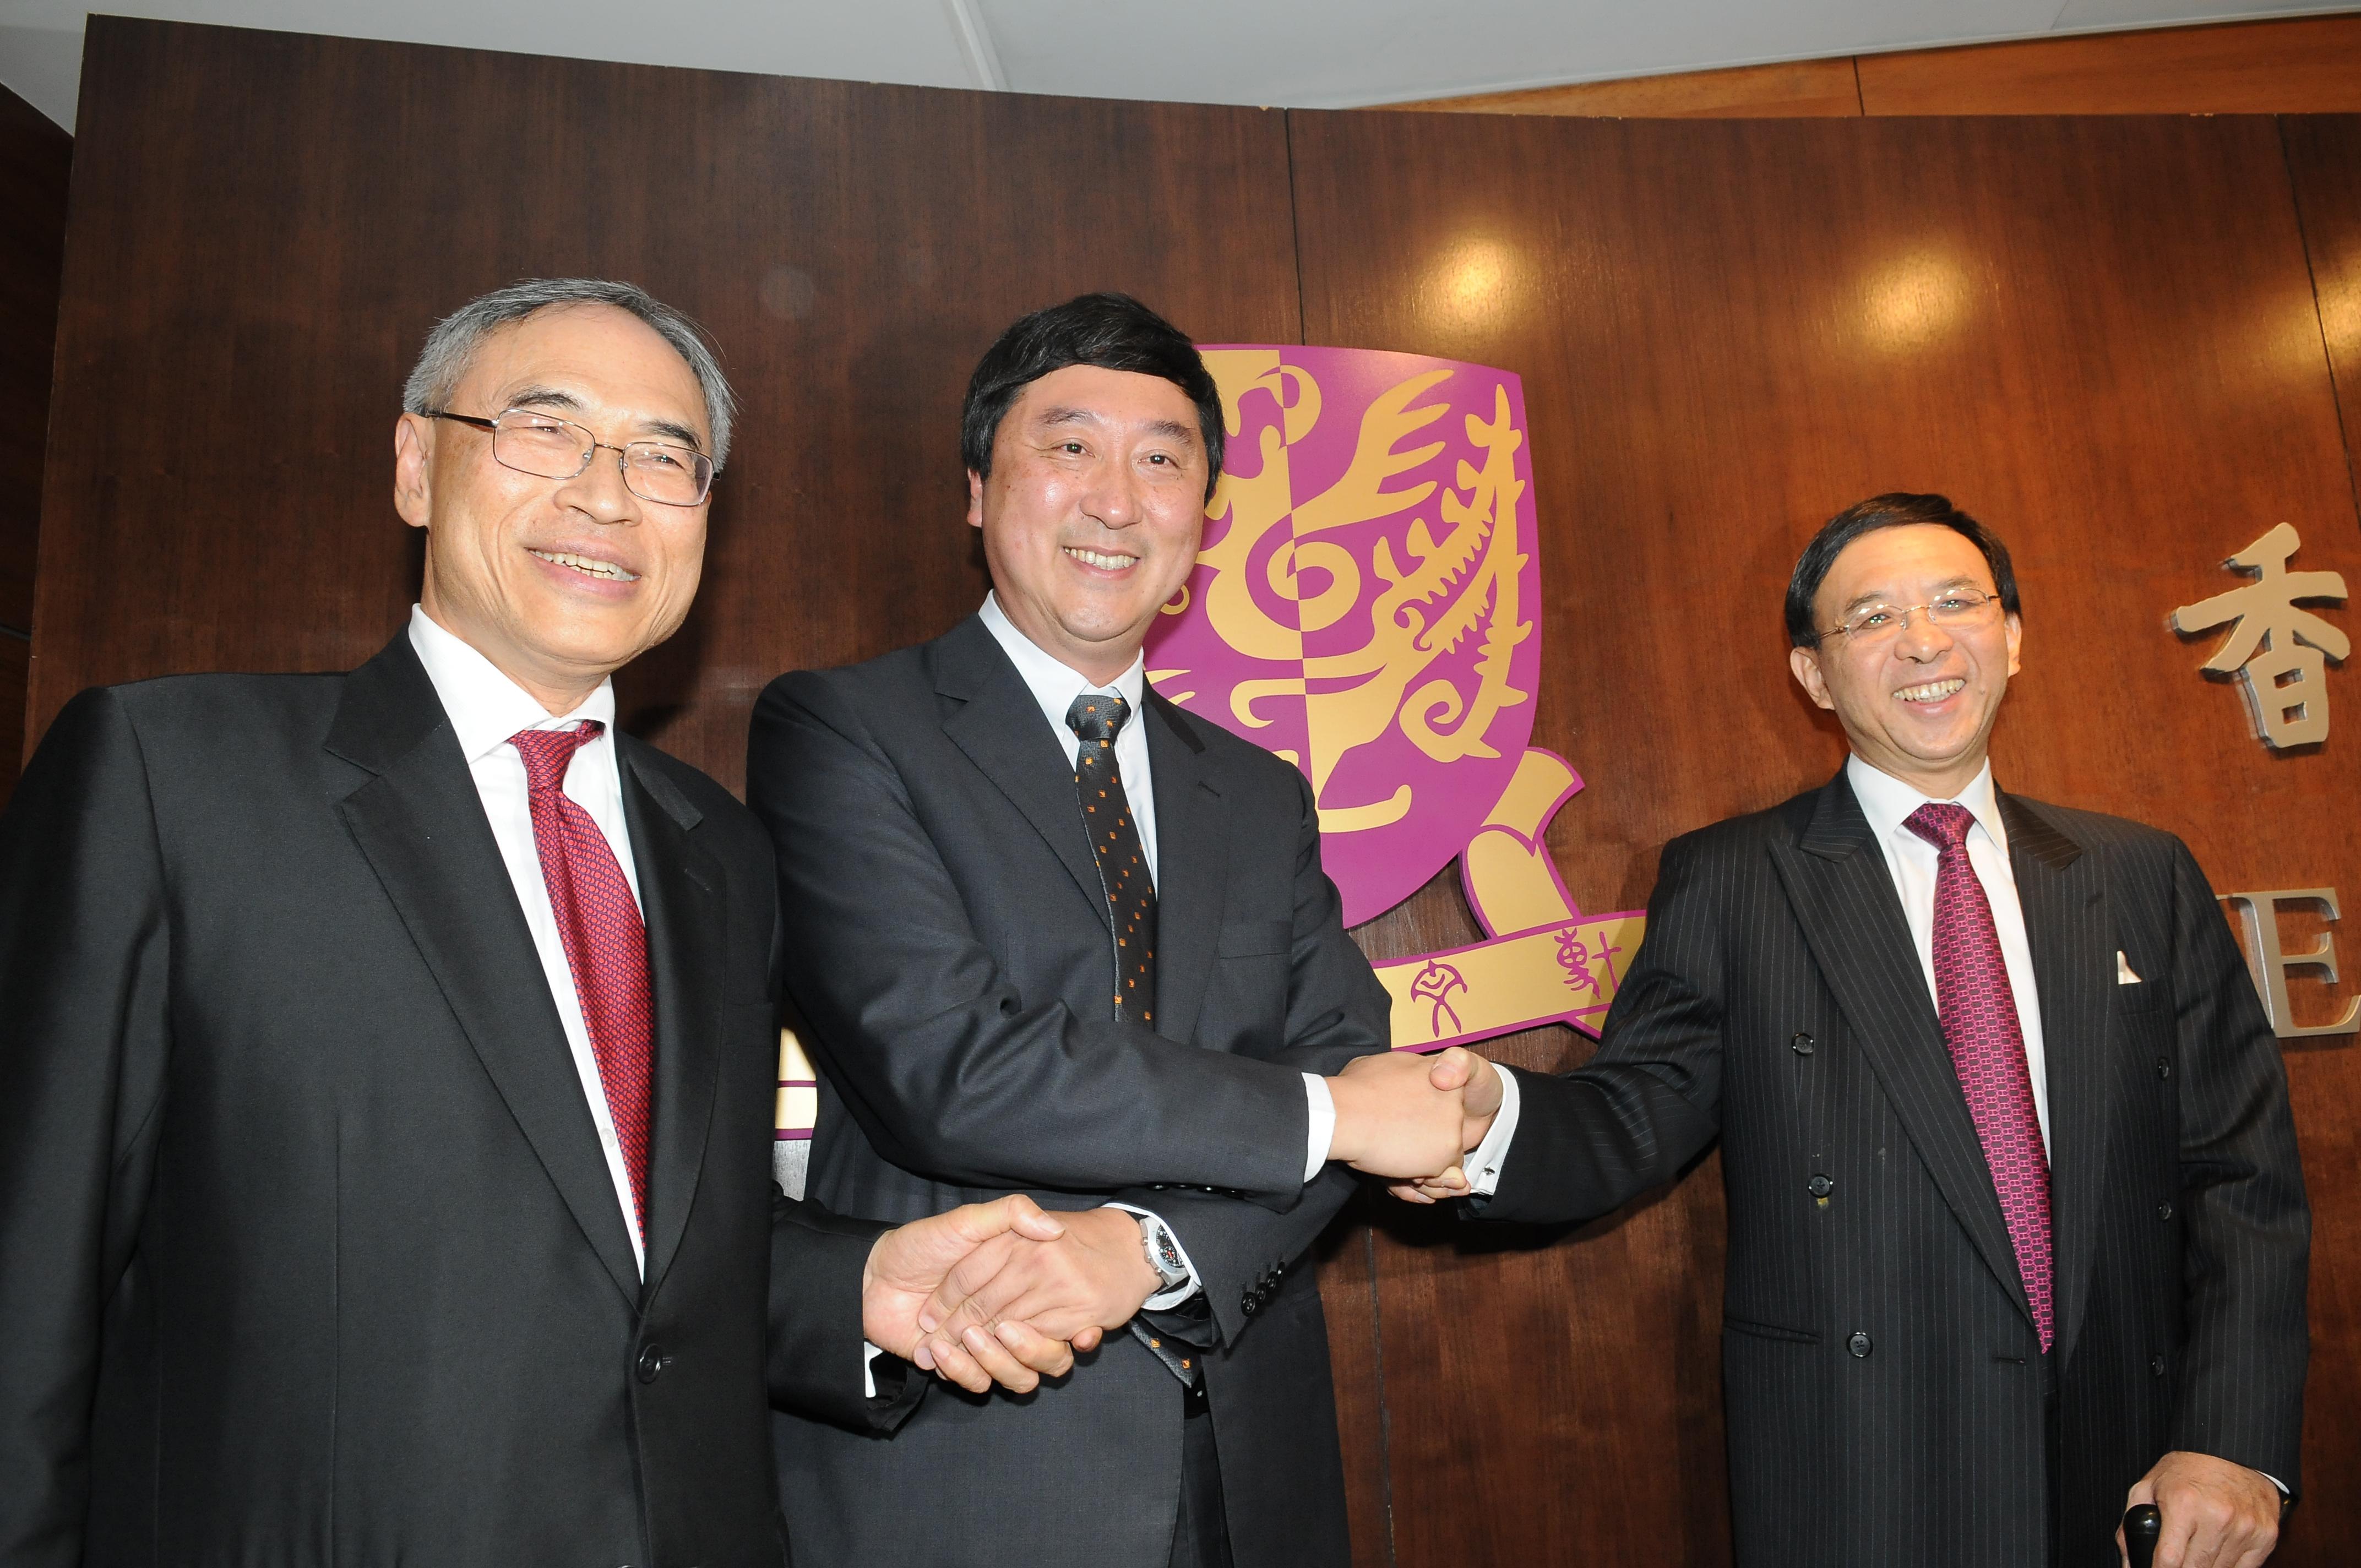 From left: Prof. Lawrence J. Lau, Vice-Chancellor, CUHK; Prof. Joseph Sung, Vice-Chancellor Designate; and Dr. Vincent Cheng, Chairman of the University Council, CUHK